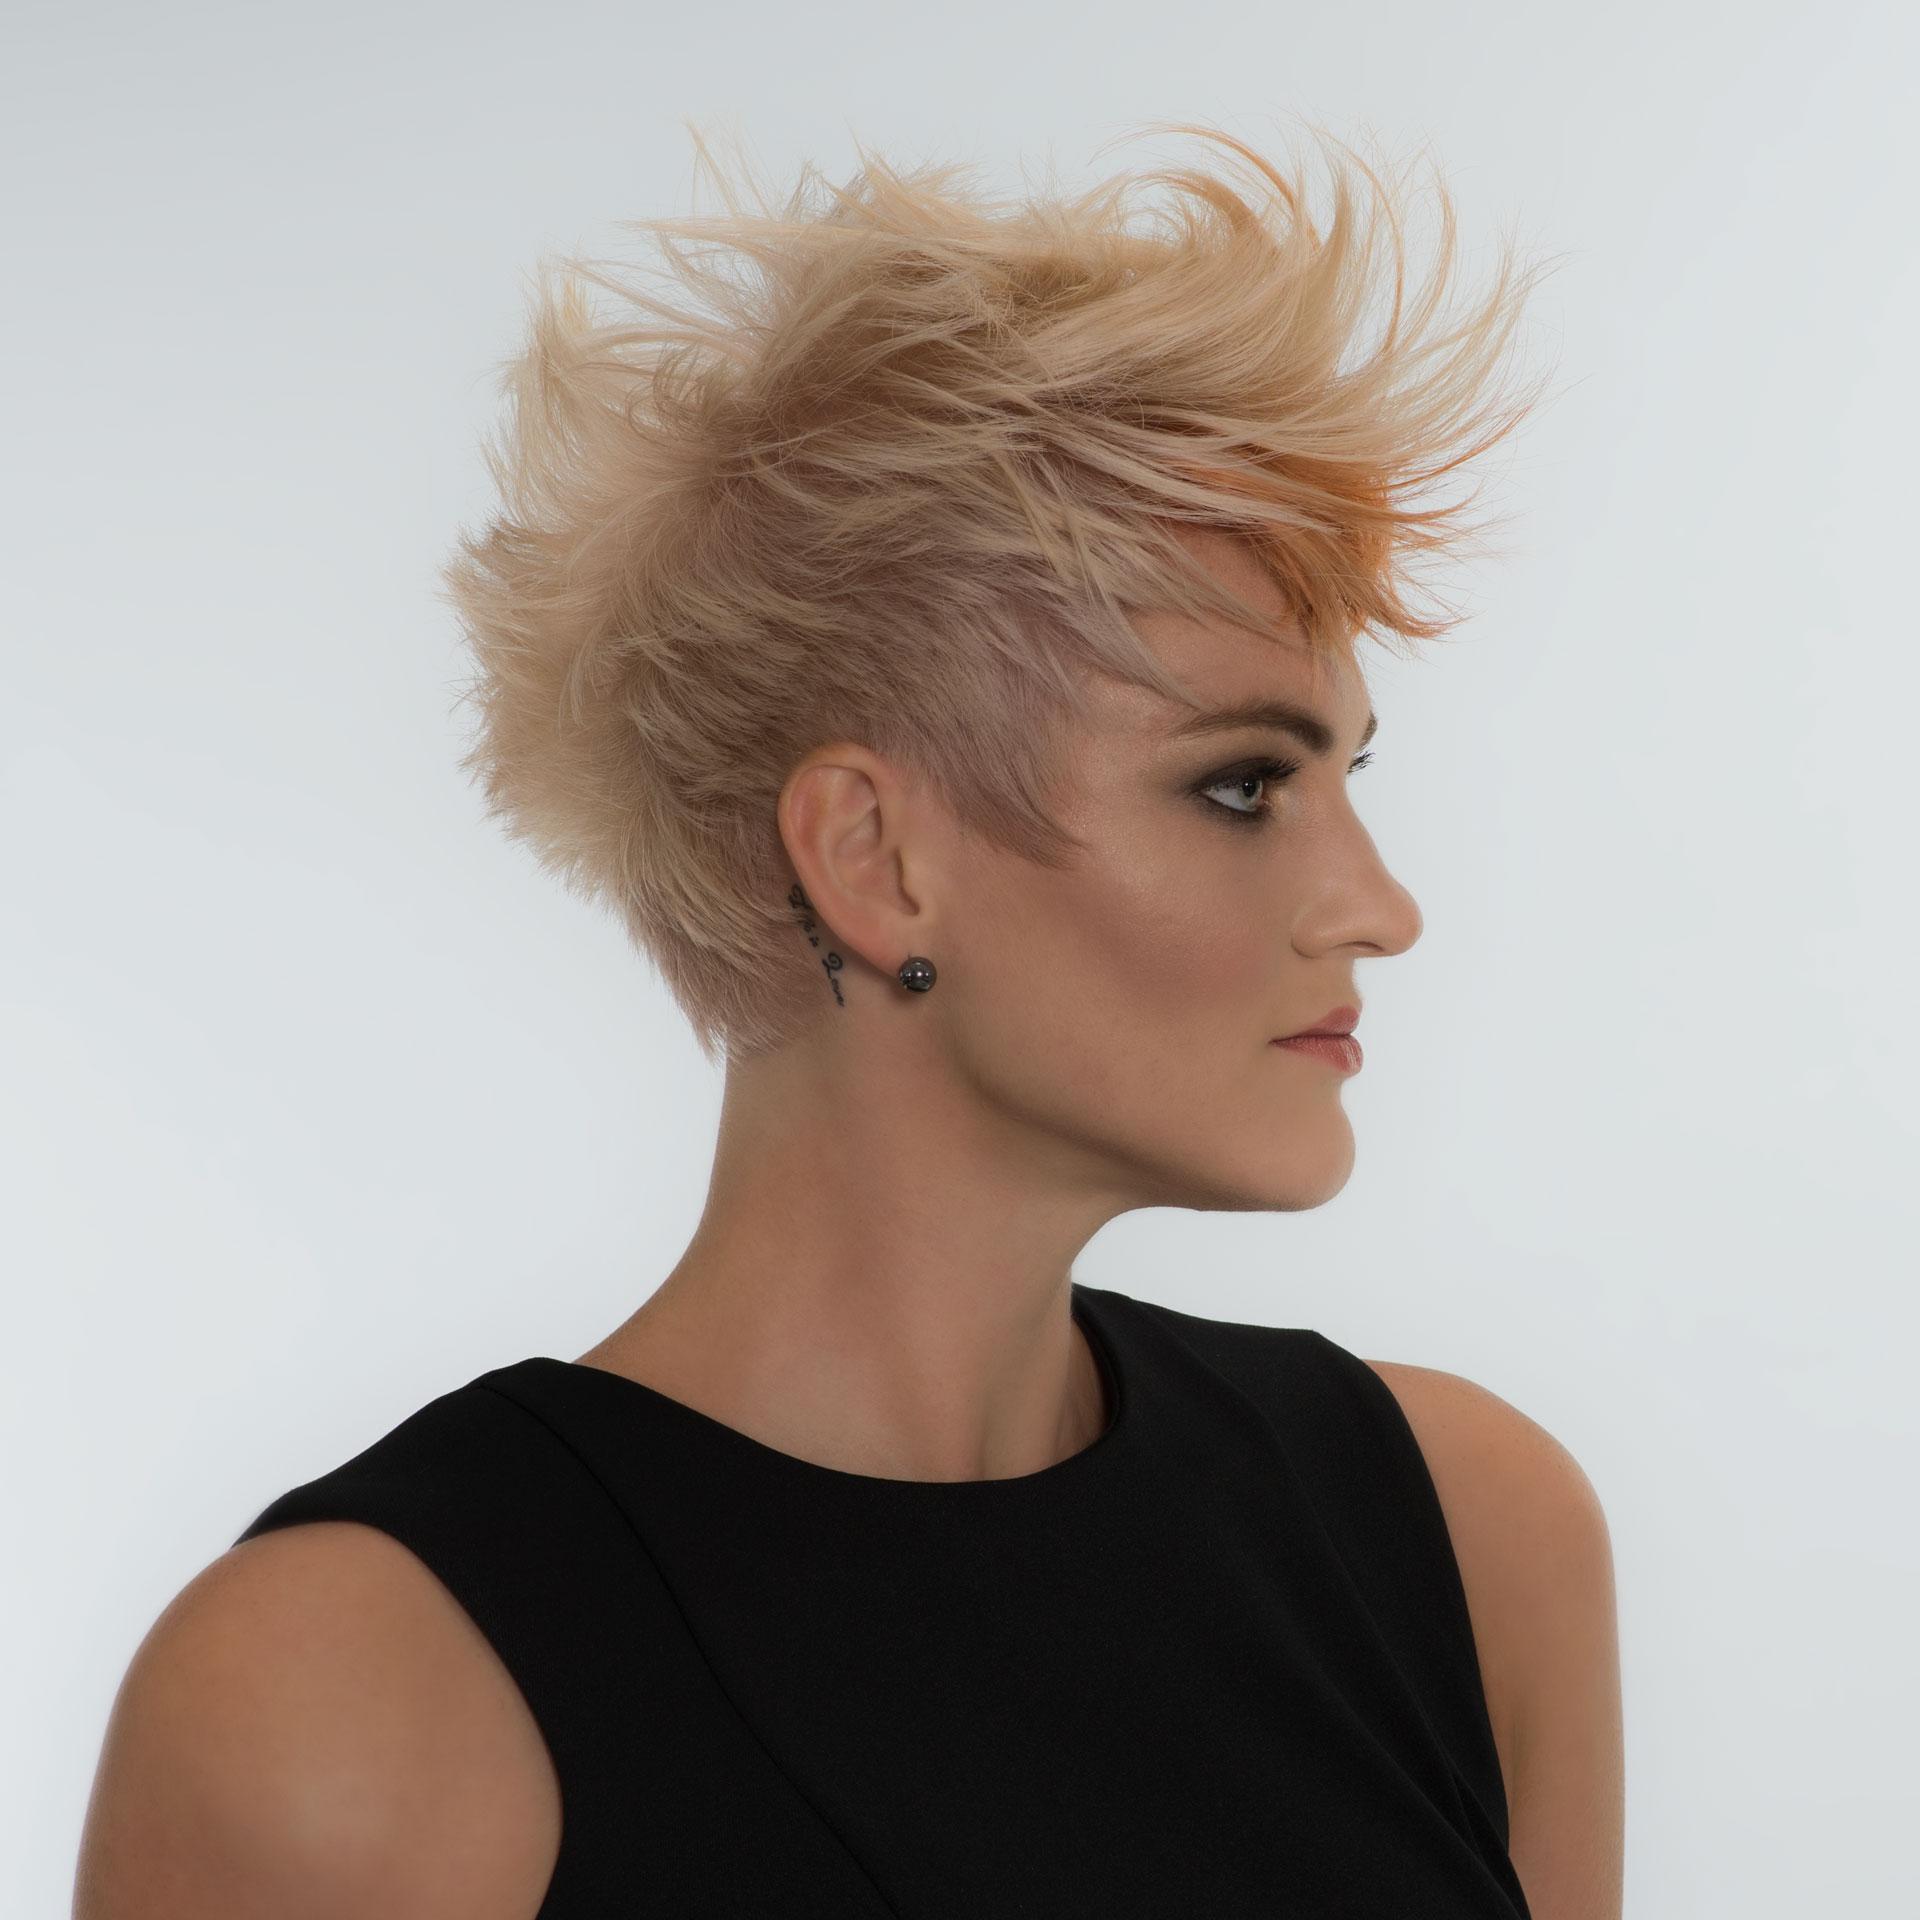 Pixie short Haircut Plano Frisco Dallas Best Hair Salon Allen McKinney Addison TX DFW Top Master Hair Stylist Upscale Salon High End Hair salon DFW TX AALAM The Salon 2